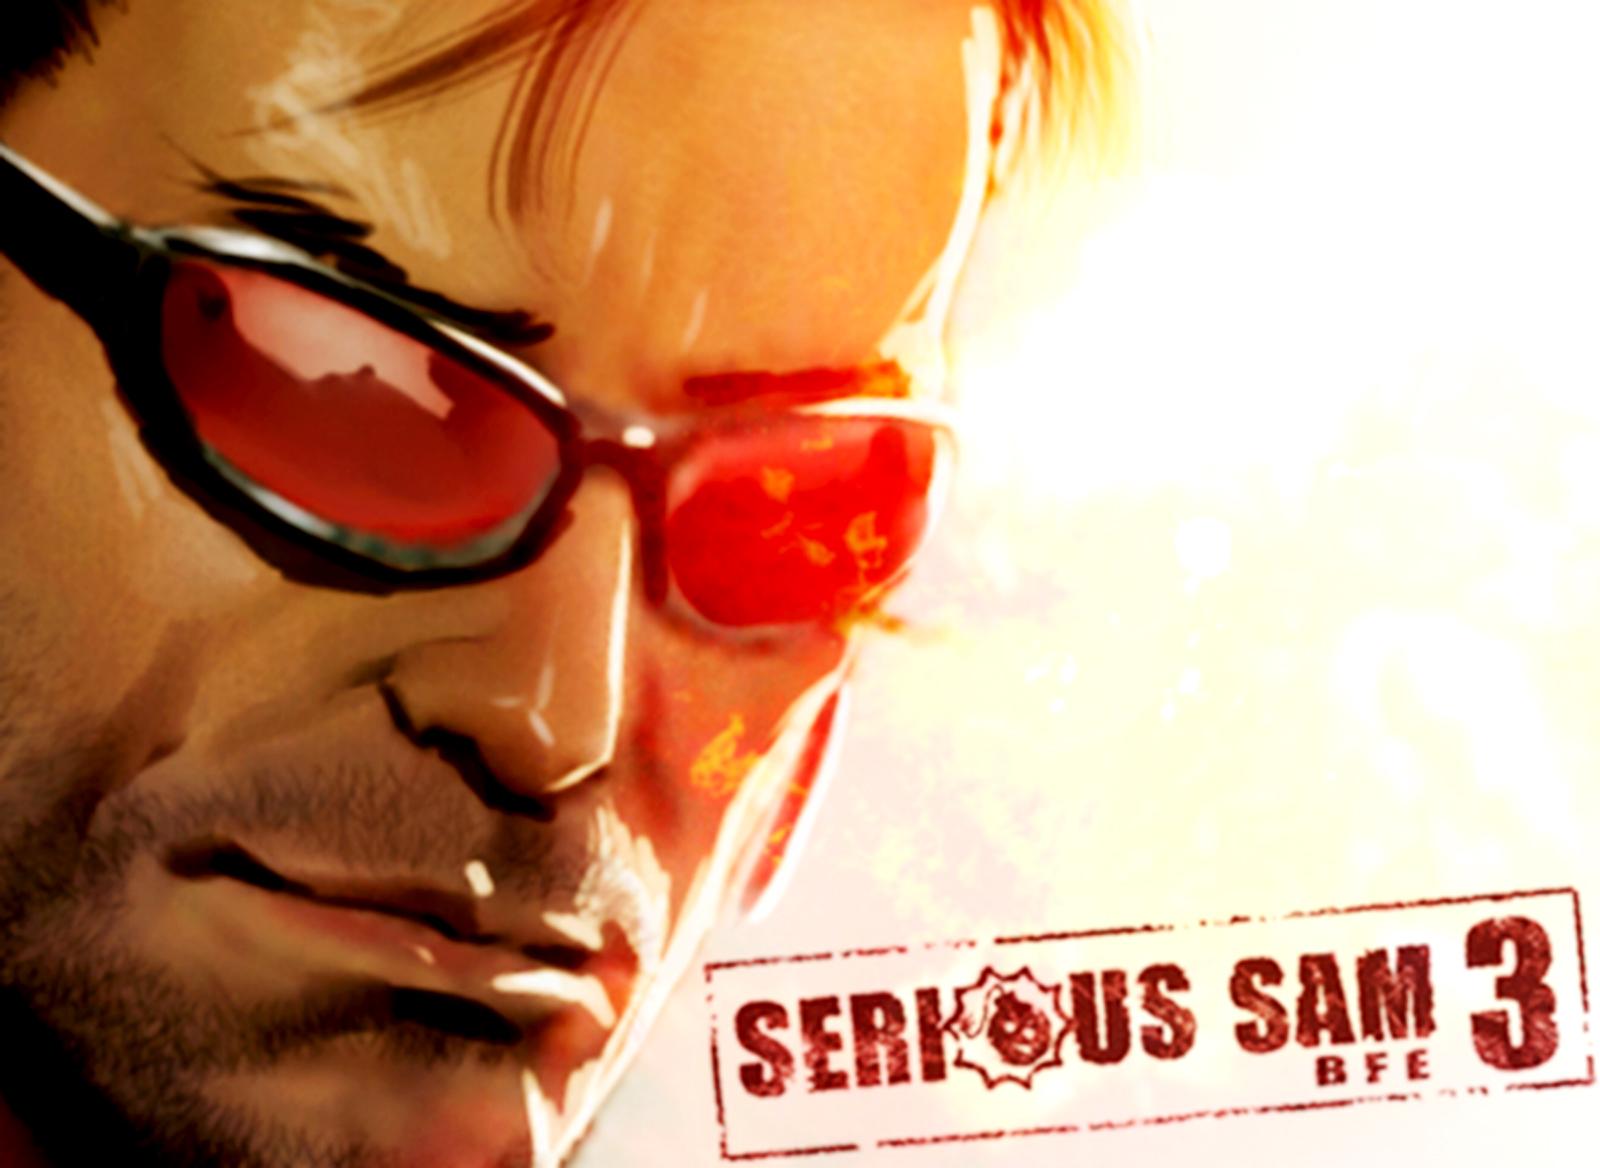 Serious Sam 3 wallpaper 5